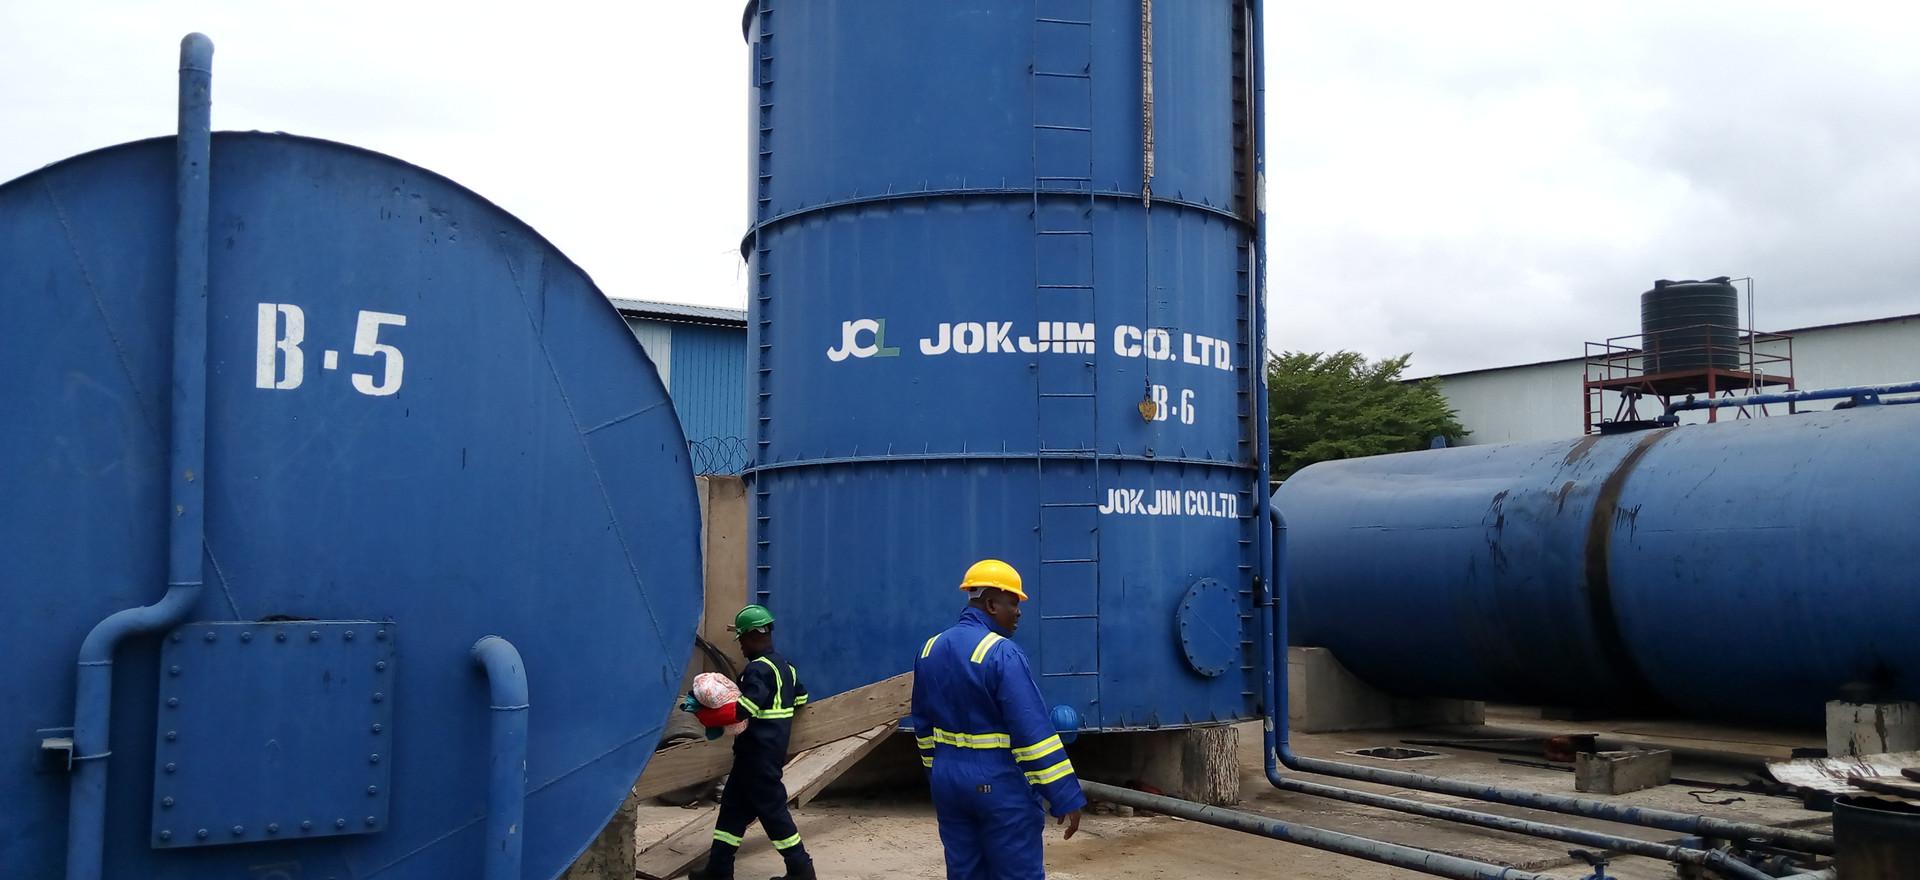 Jokjim Company Limited